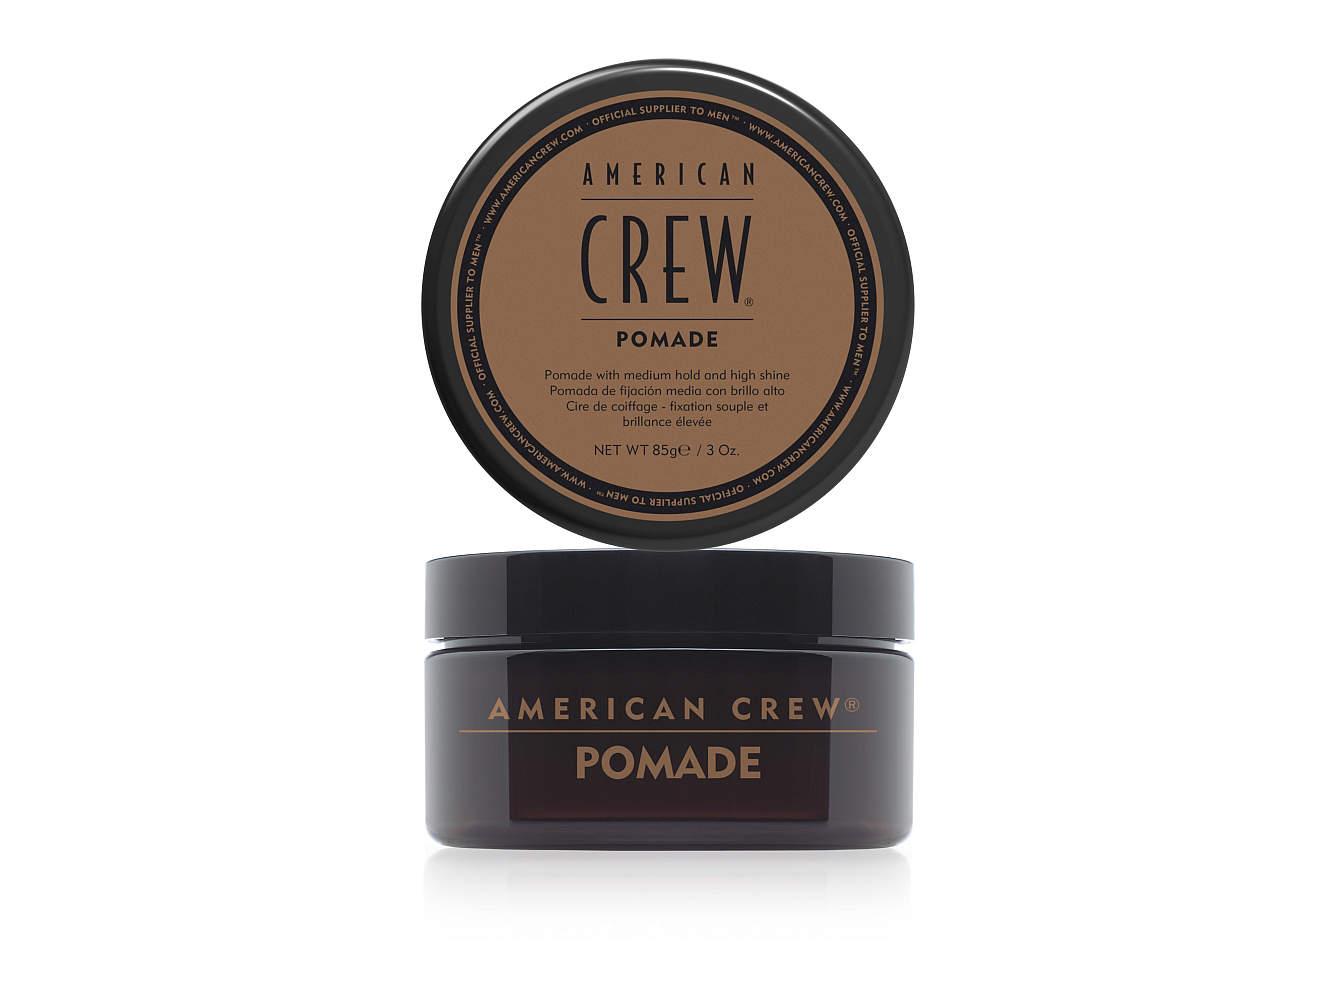 Arma Beauty - American Crew - Pomade